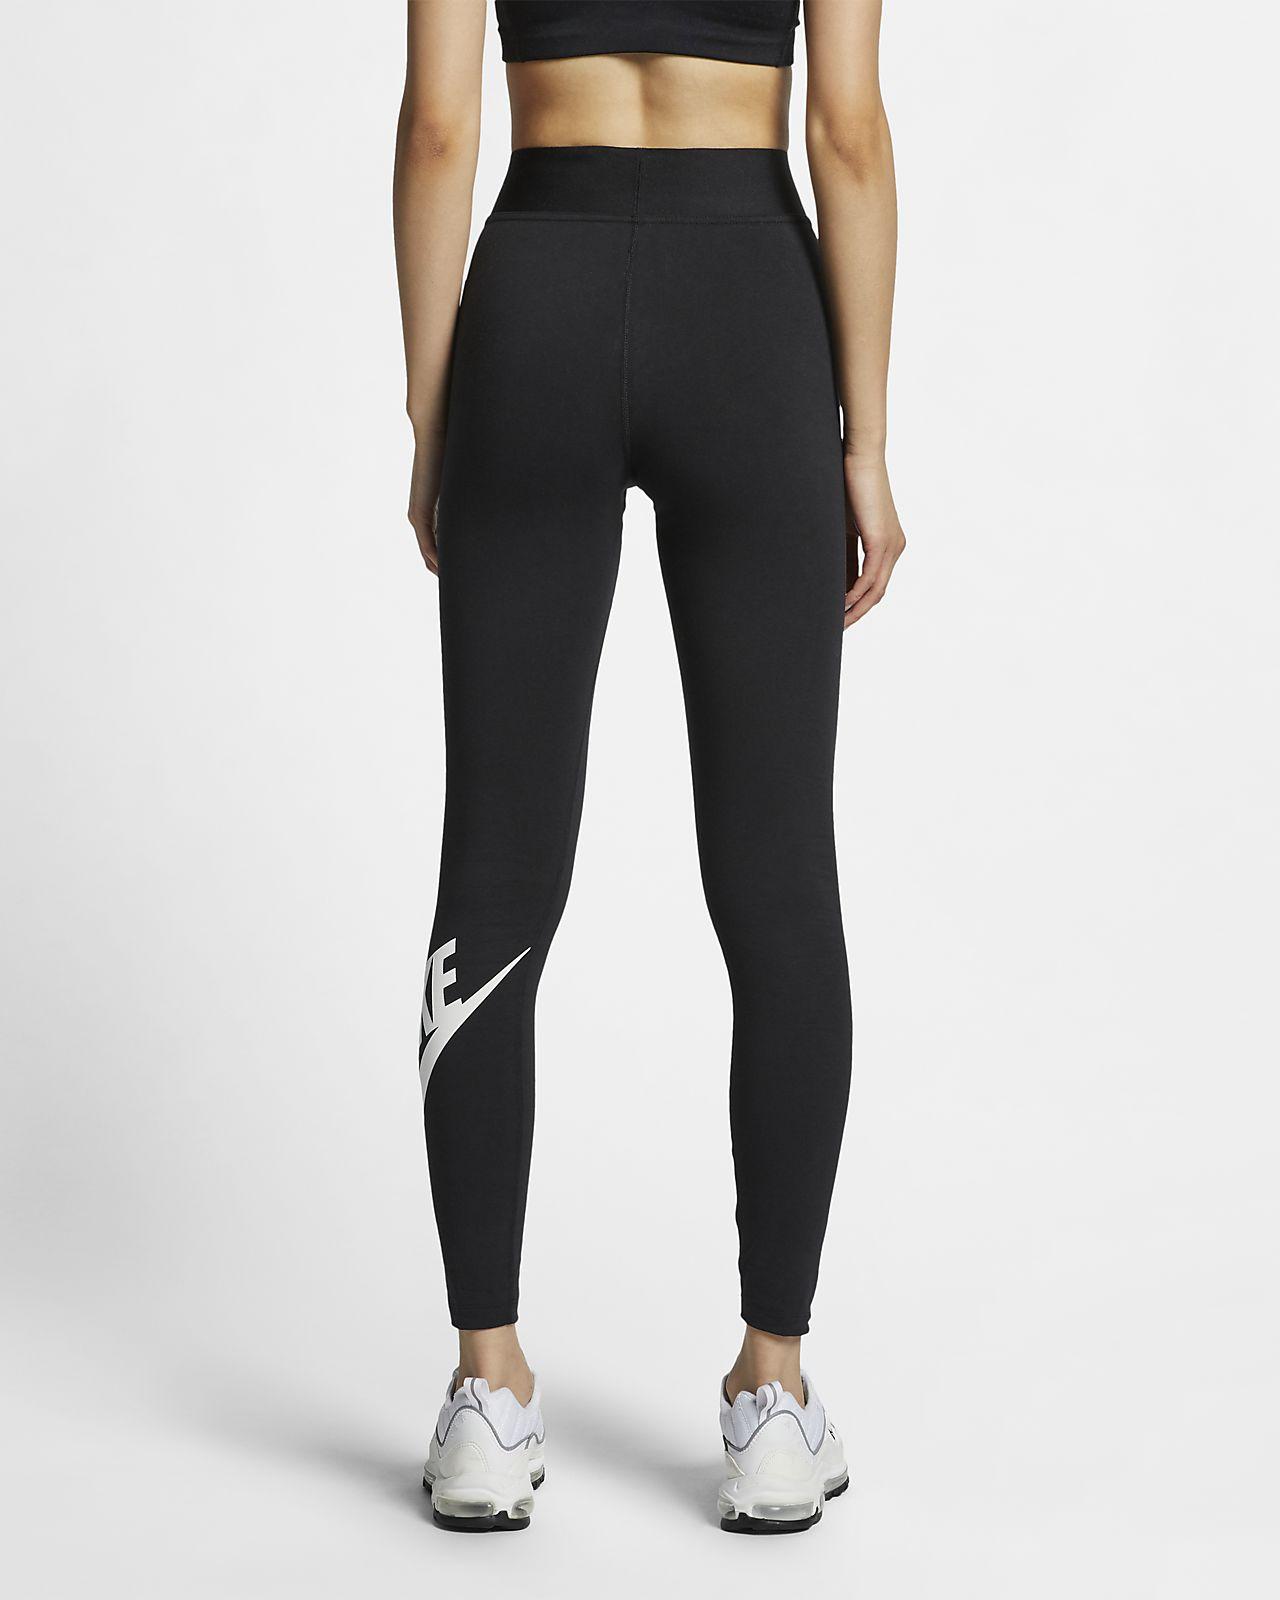 b5a4175b Nike Sportswear Leg-A-See Women's High-Waisted Leggings